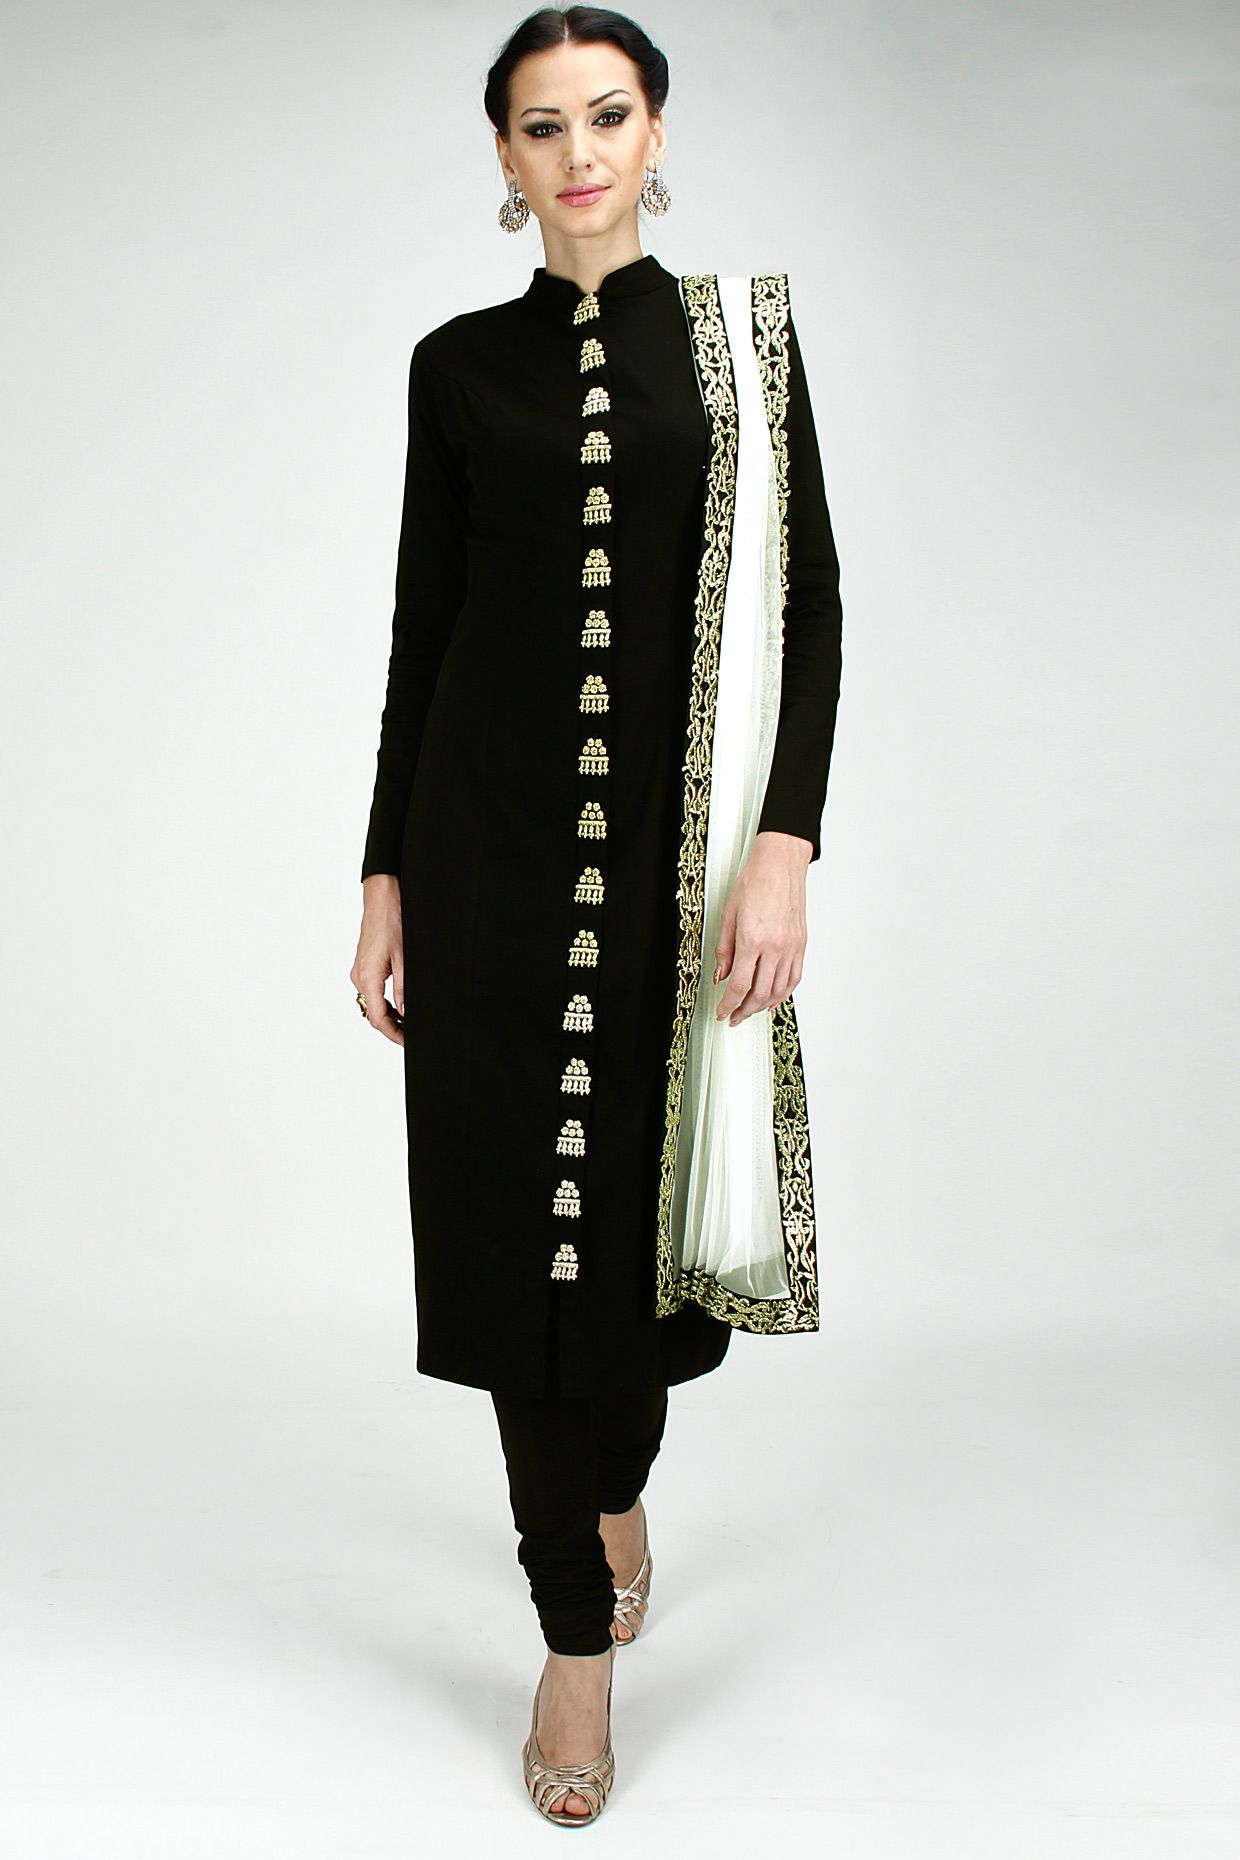 Black zardosi embroidered straight kurta set available only at